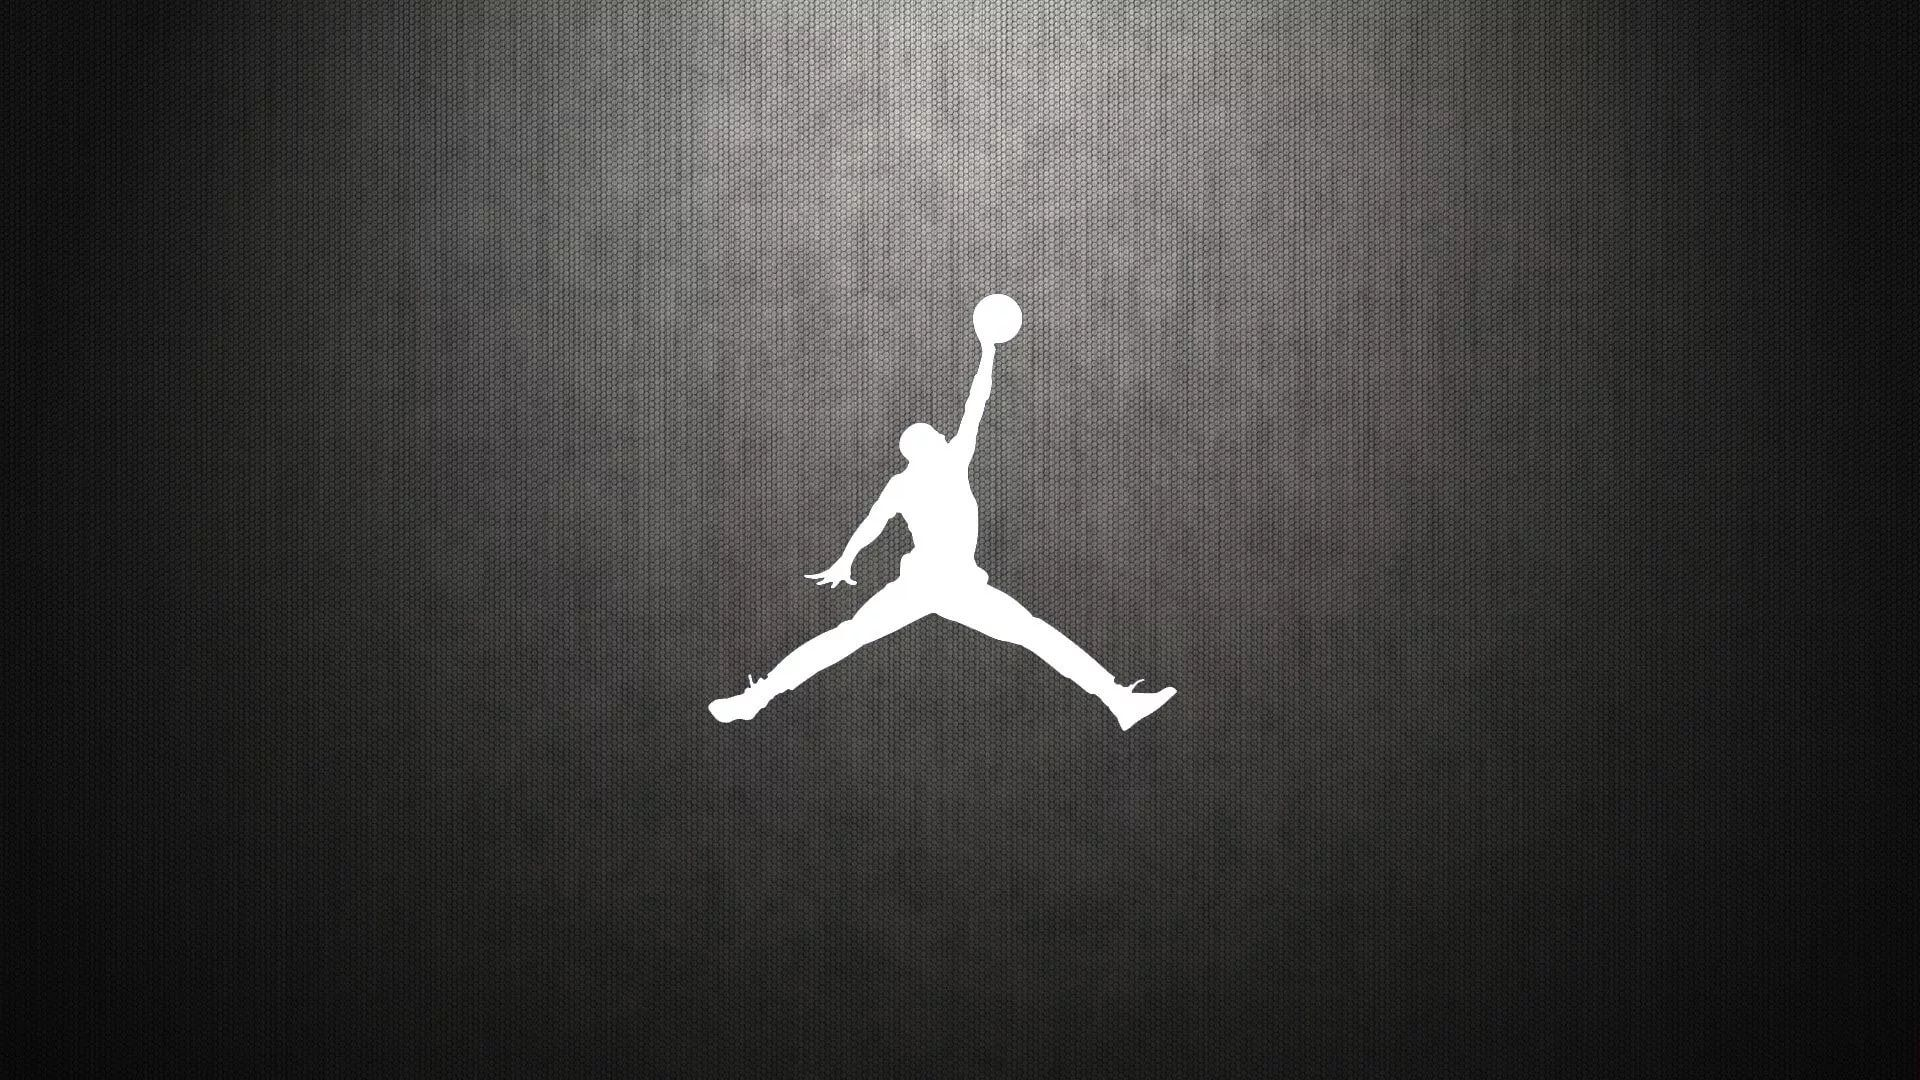 Nike Basketball Free Desktop Wallpaper